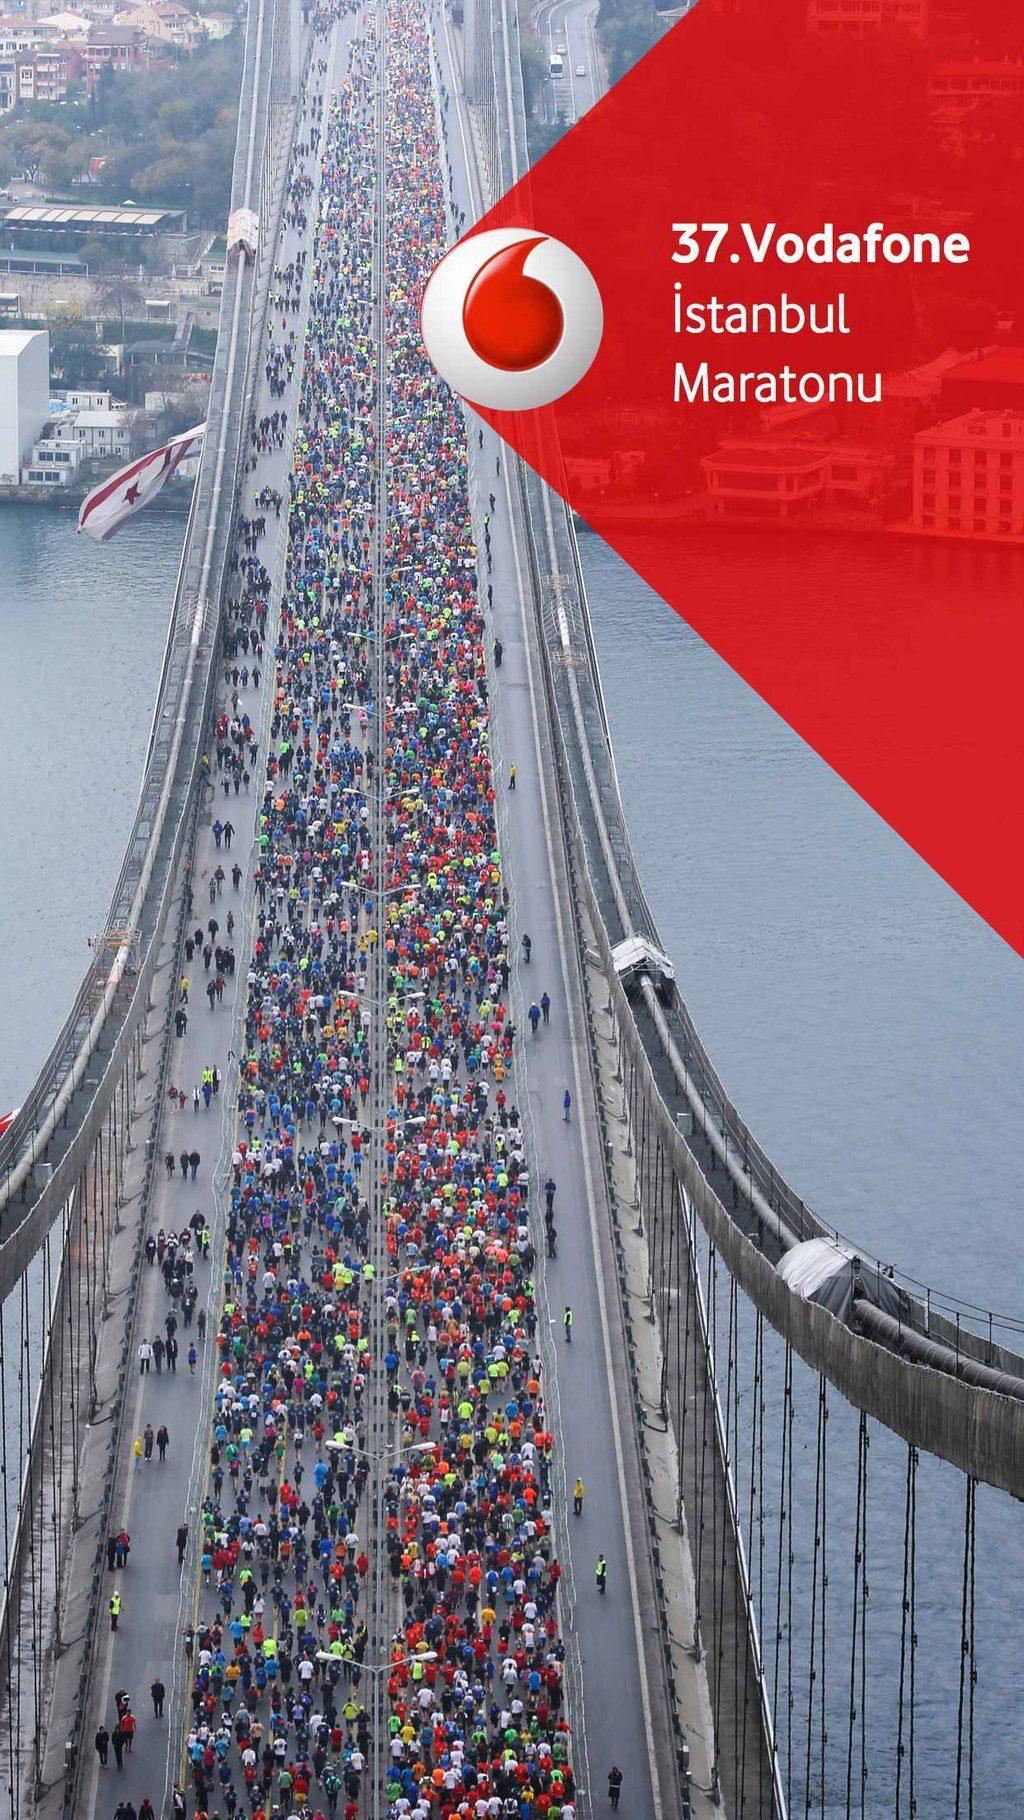 vodafone-istanbul-maratonu-37-091115-1